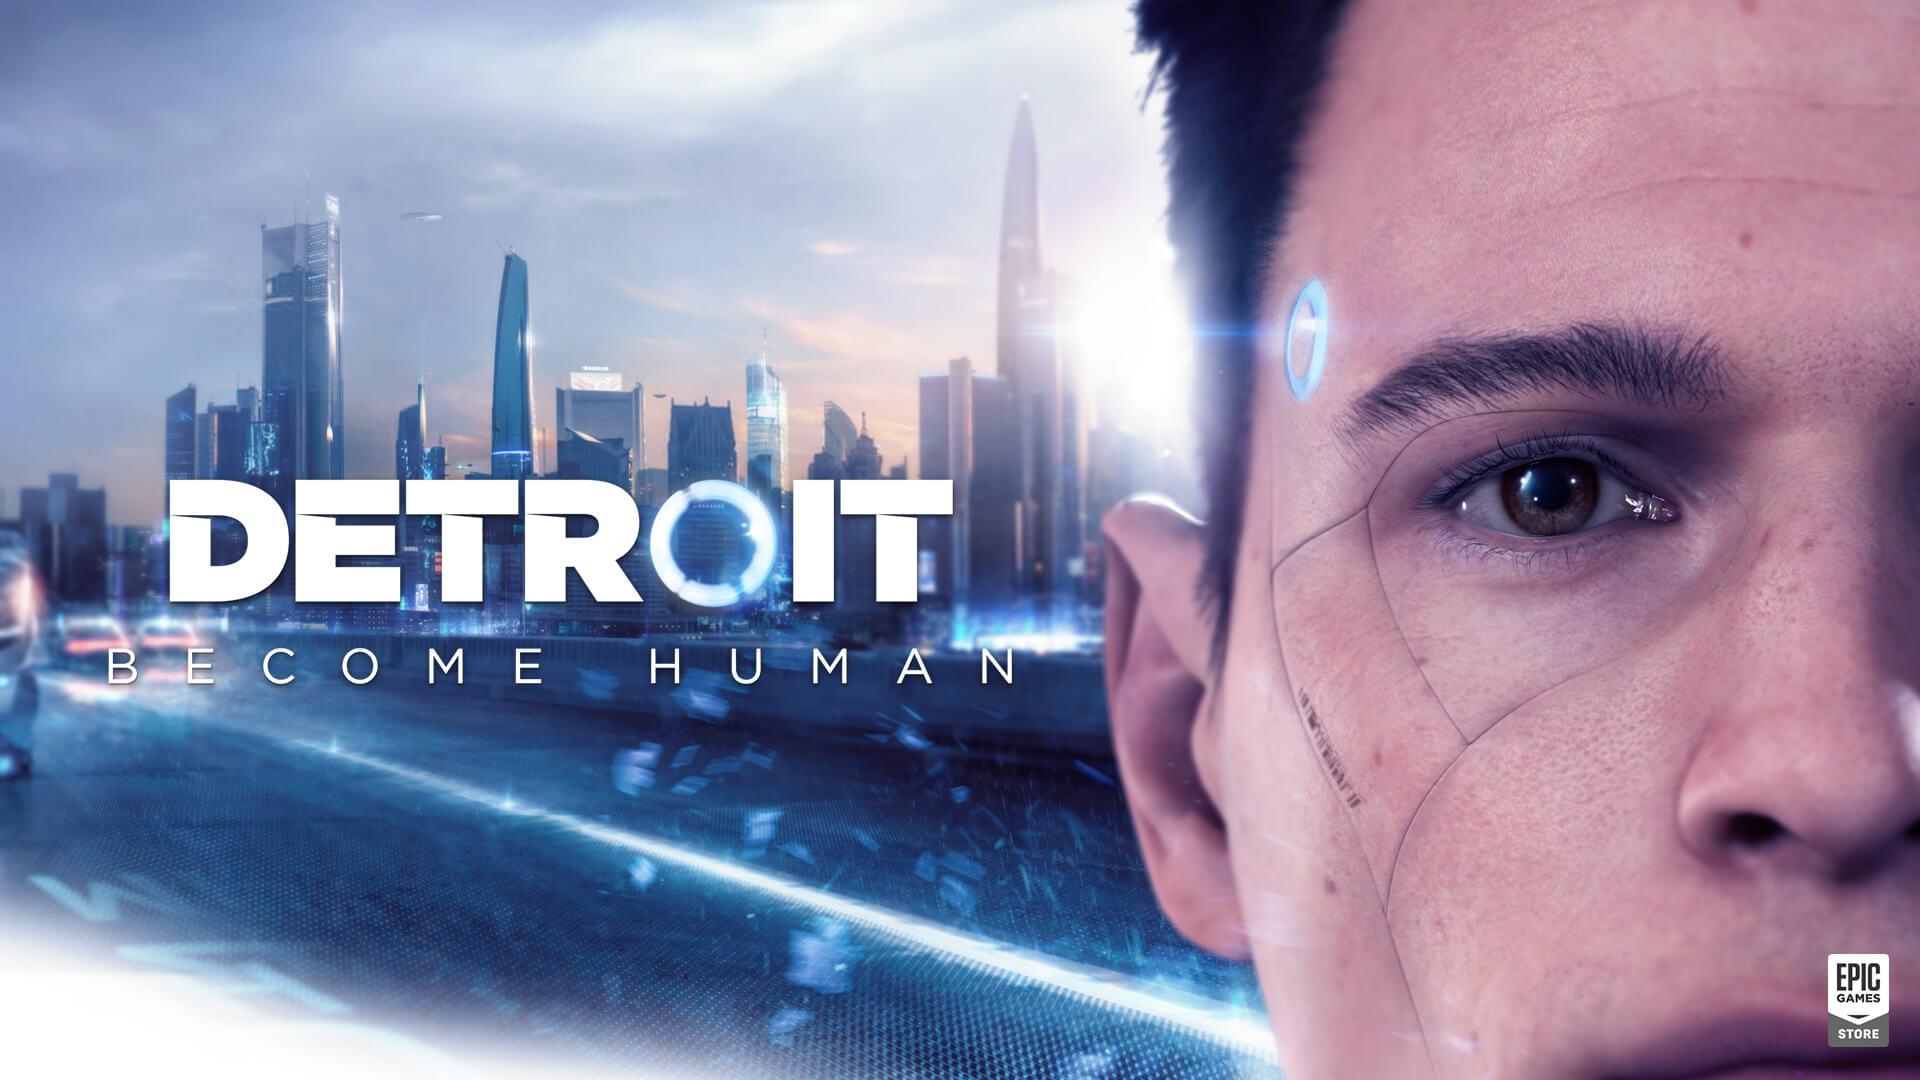 [PC VPN] Detroit: Become Human (PC) - £9.80 @ Epic games (£4.14 with voucher)